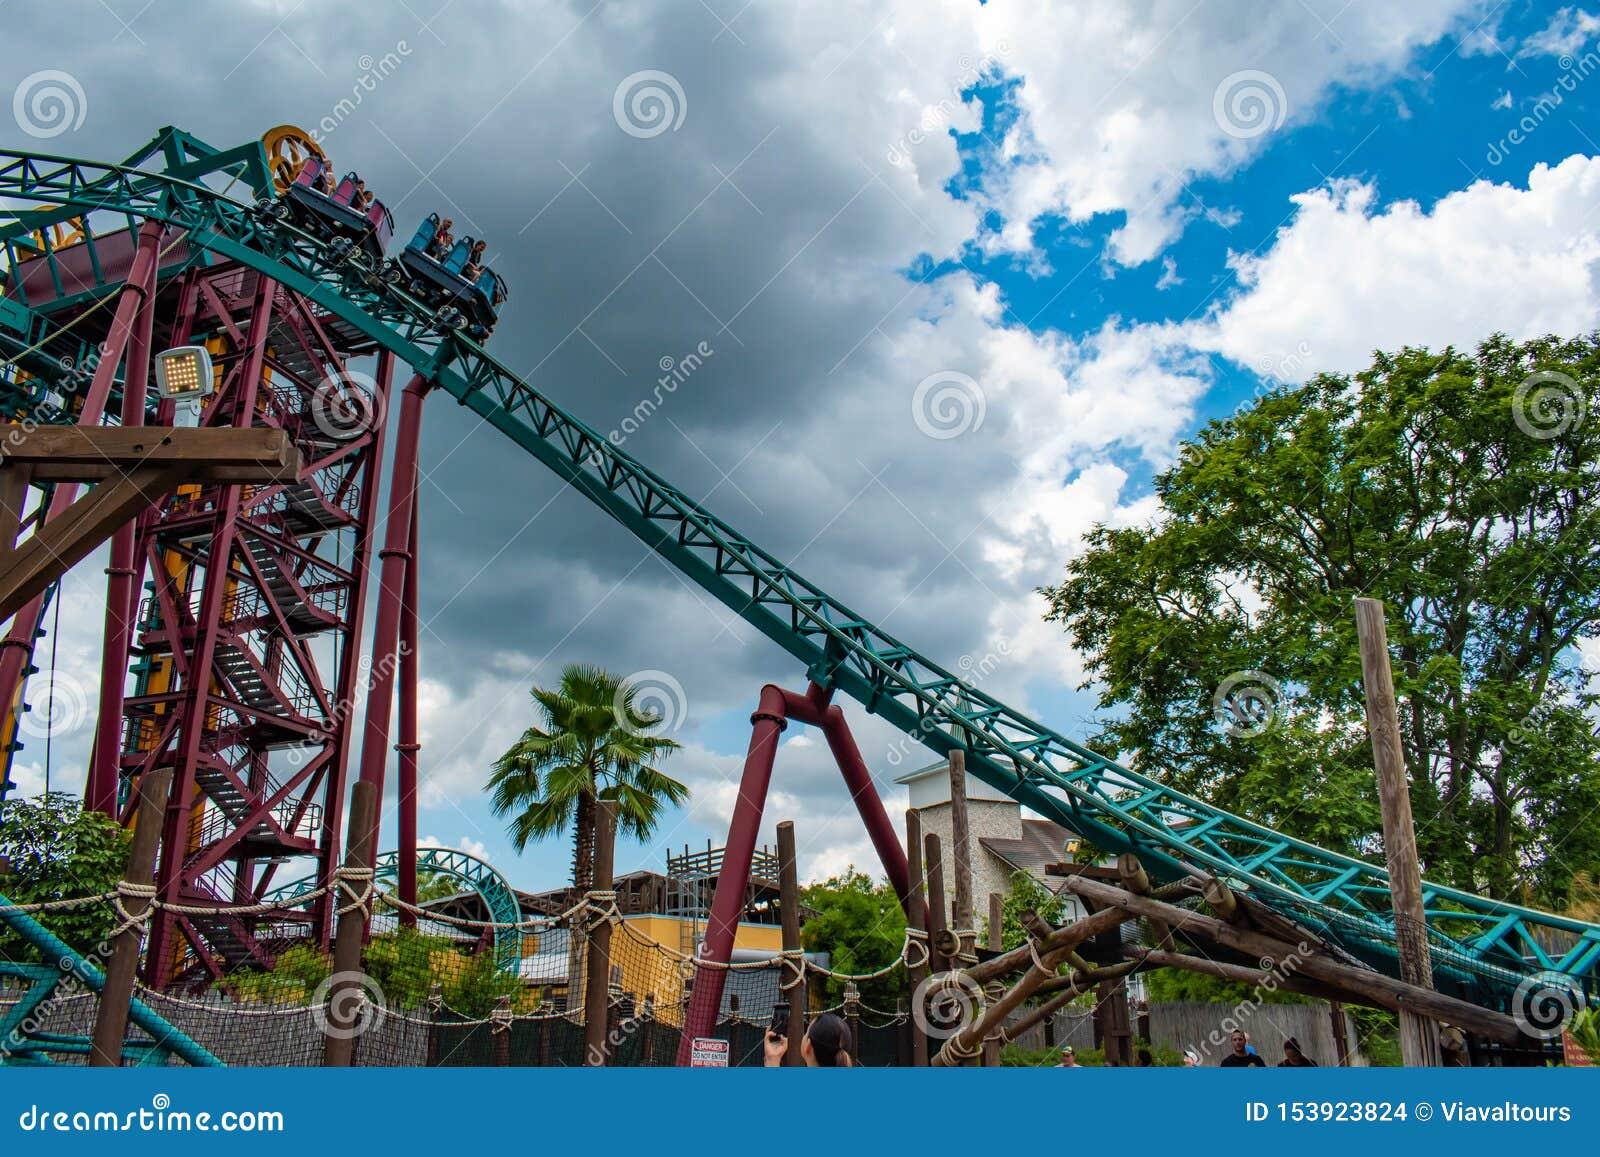 People Having Fun Terrific Cobras Curse Rollercoaster At Busch